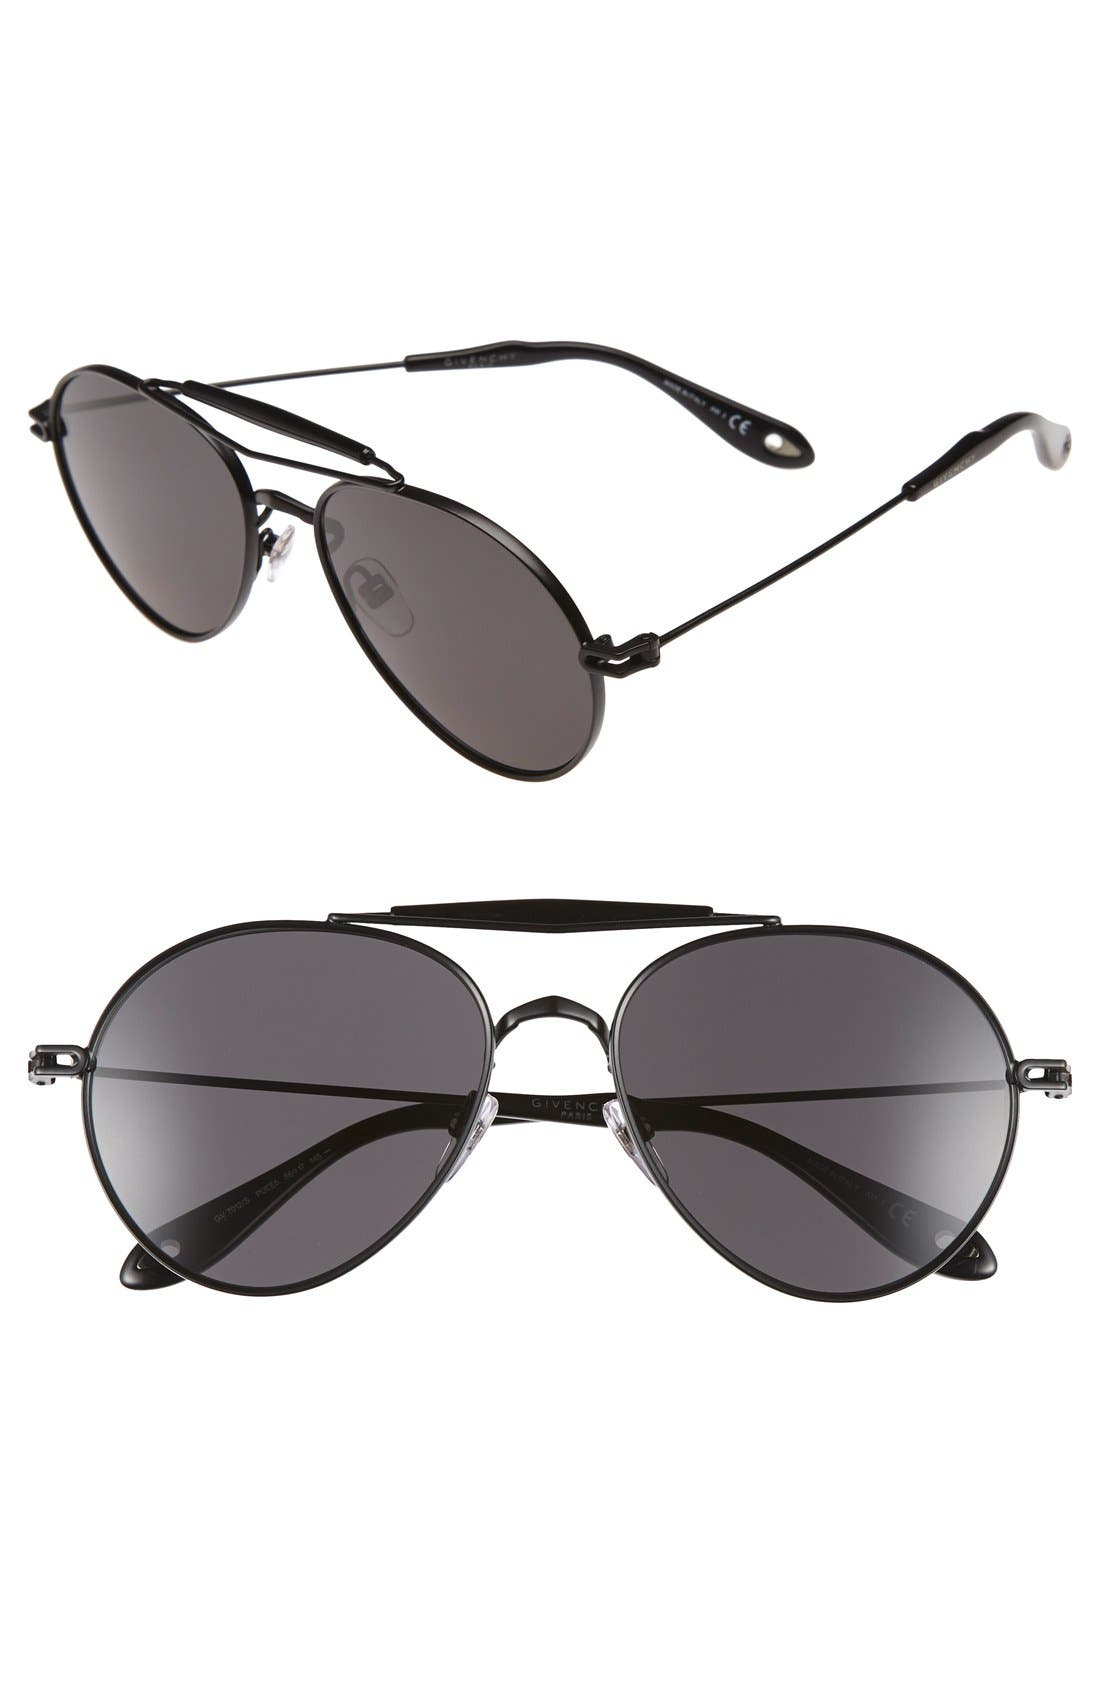 Main Image - Givenchy '7012/S' 56mm Sunglasses